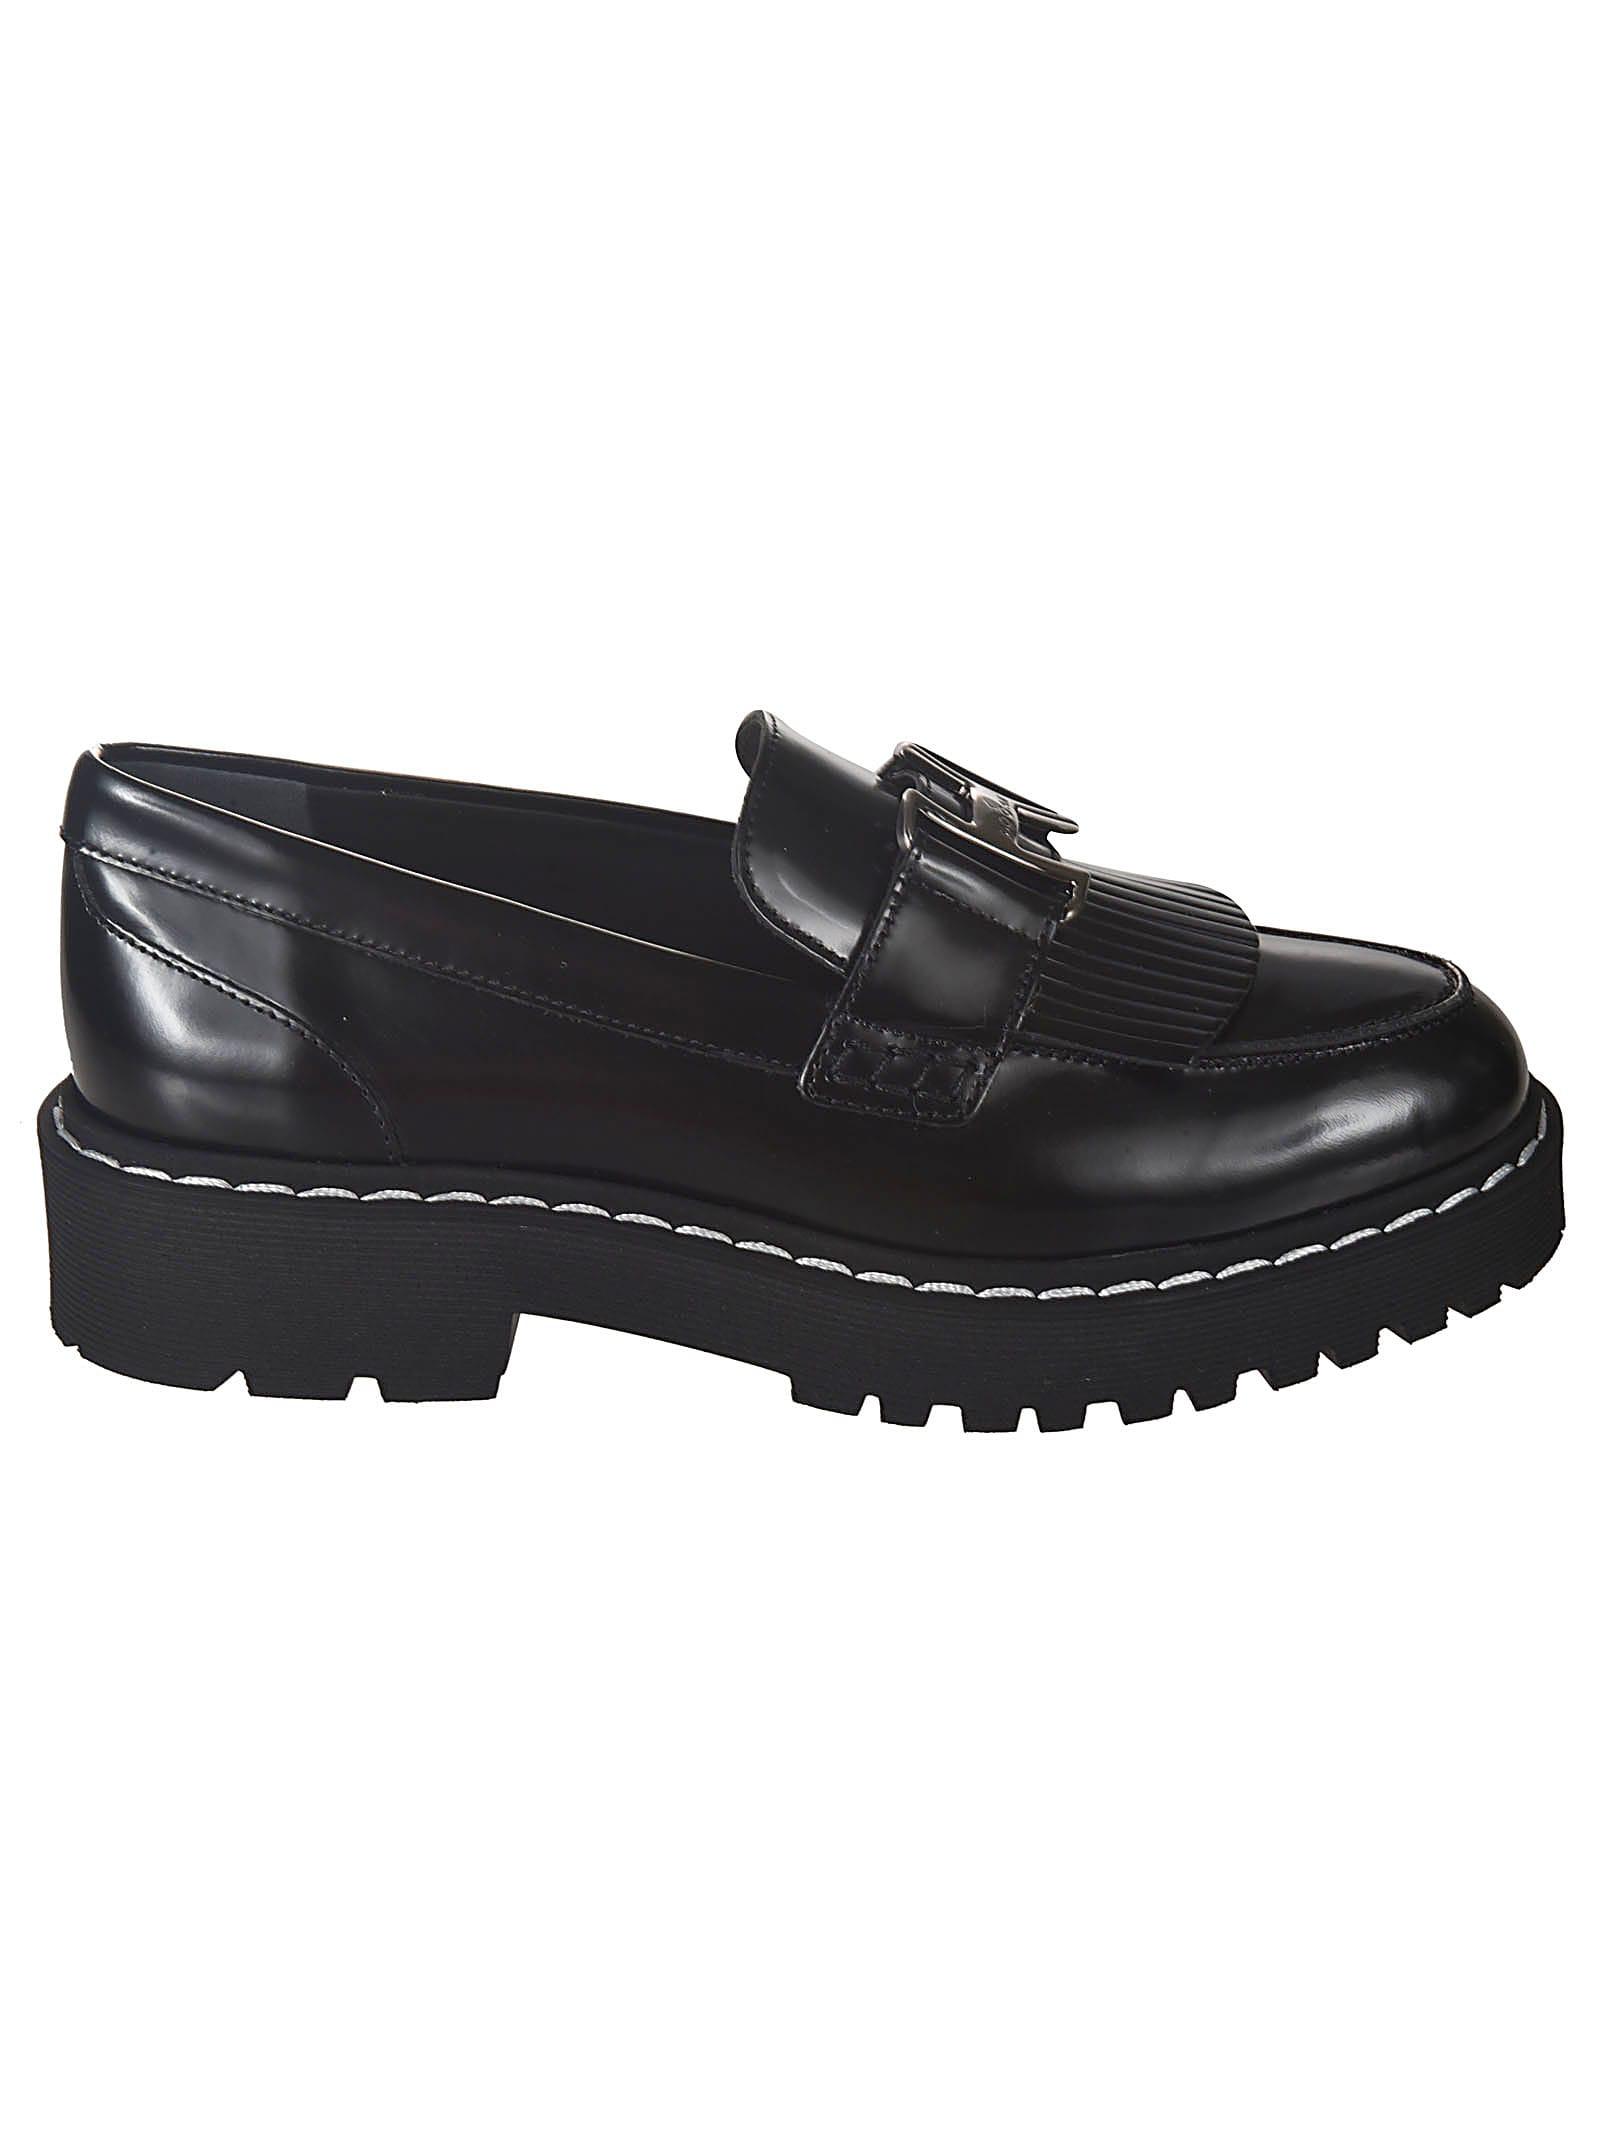 Hogan H543 Loafers